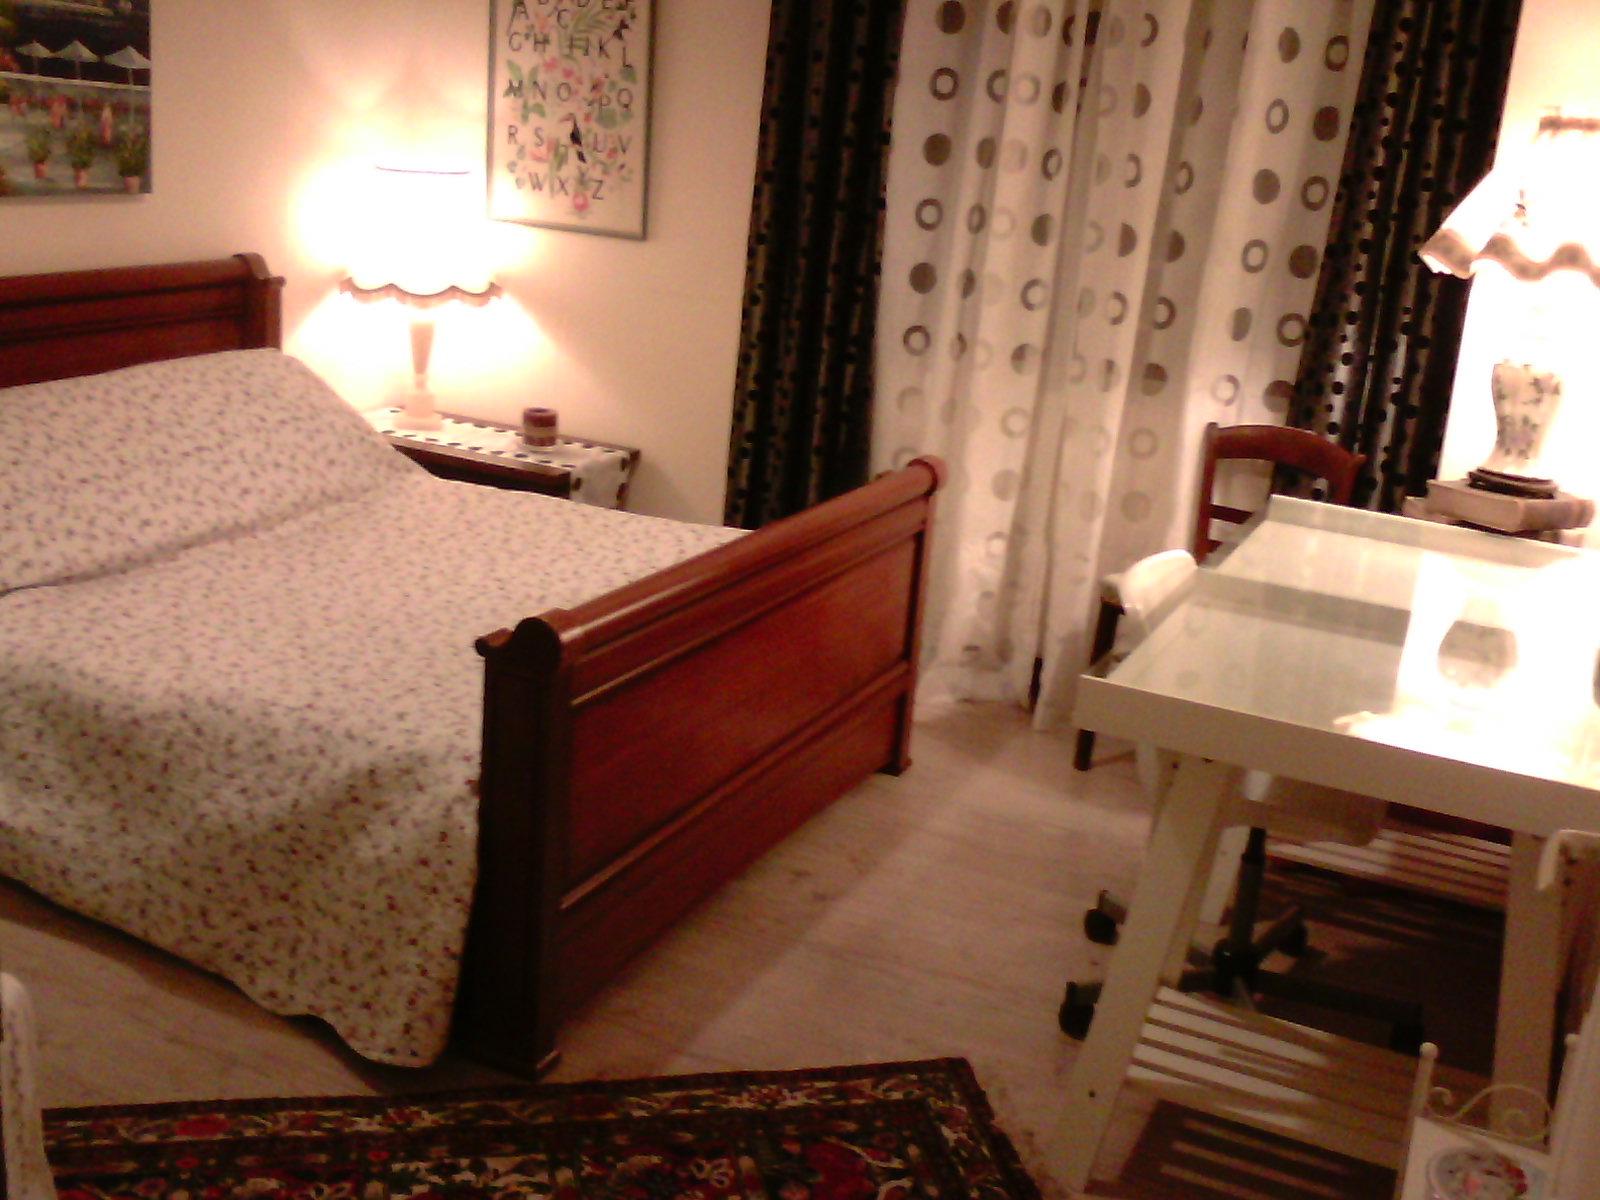 Cuisine-Colocation Chamboret NA & Location Chambre à louer Chamboret NA | Loue chambre meublée Chamboret NA | Logement Chamboret NA